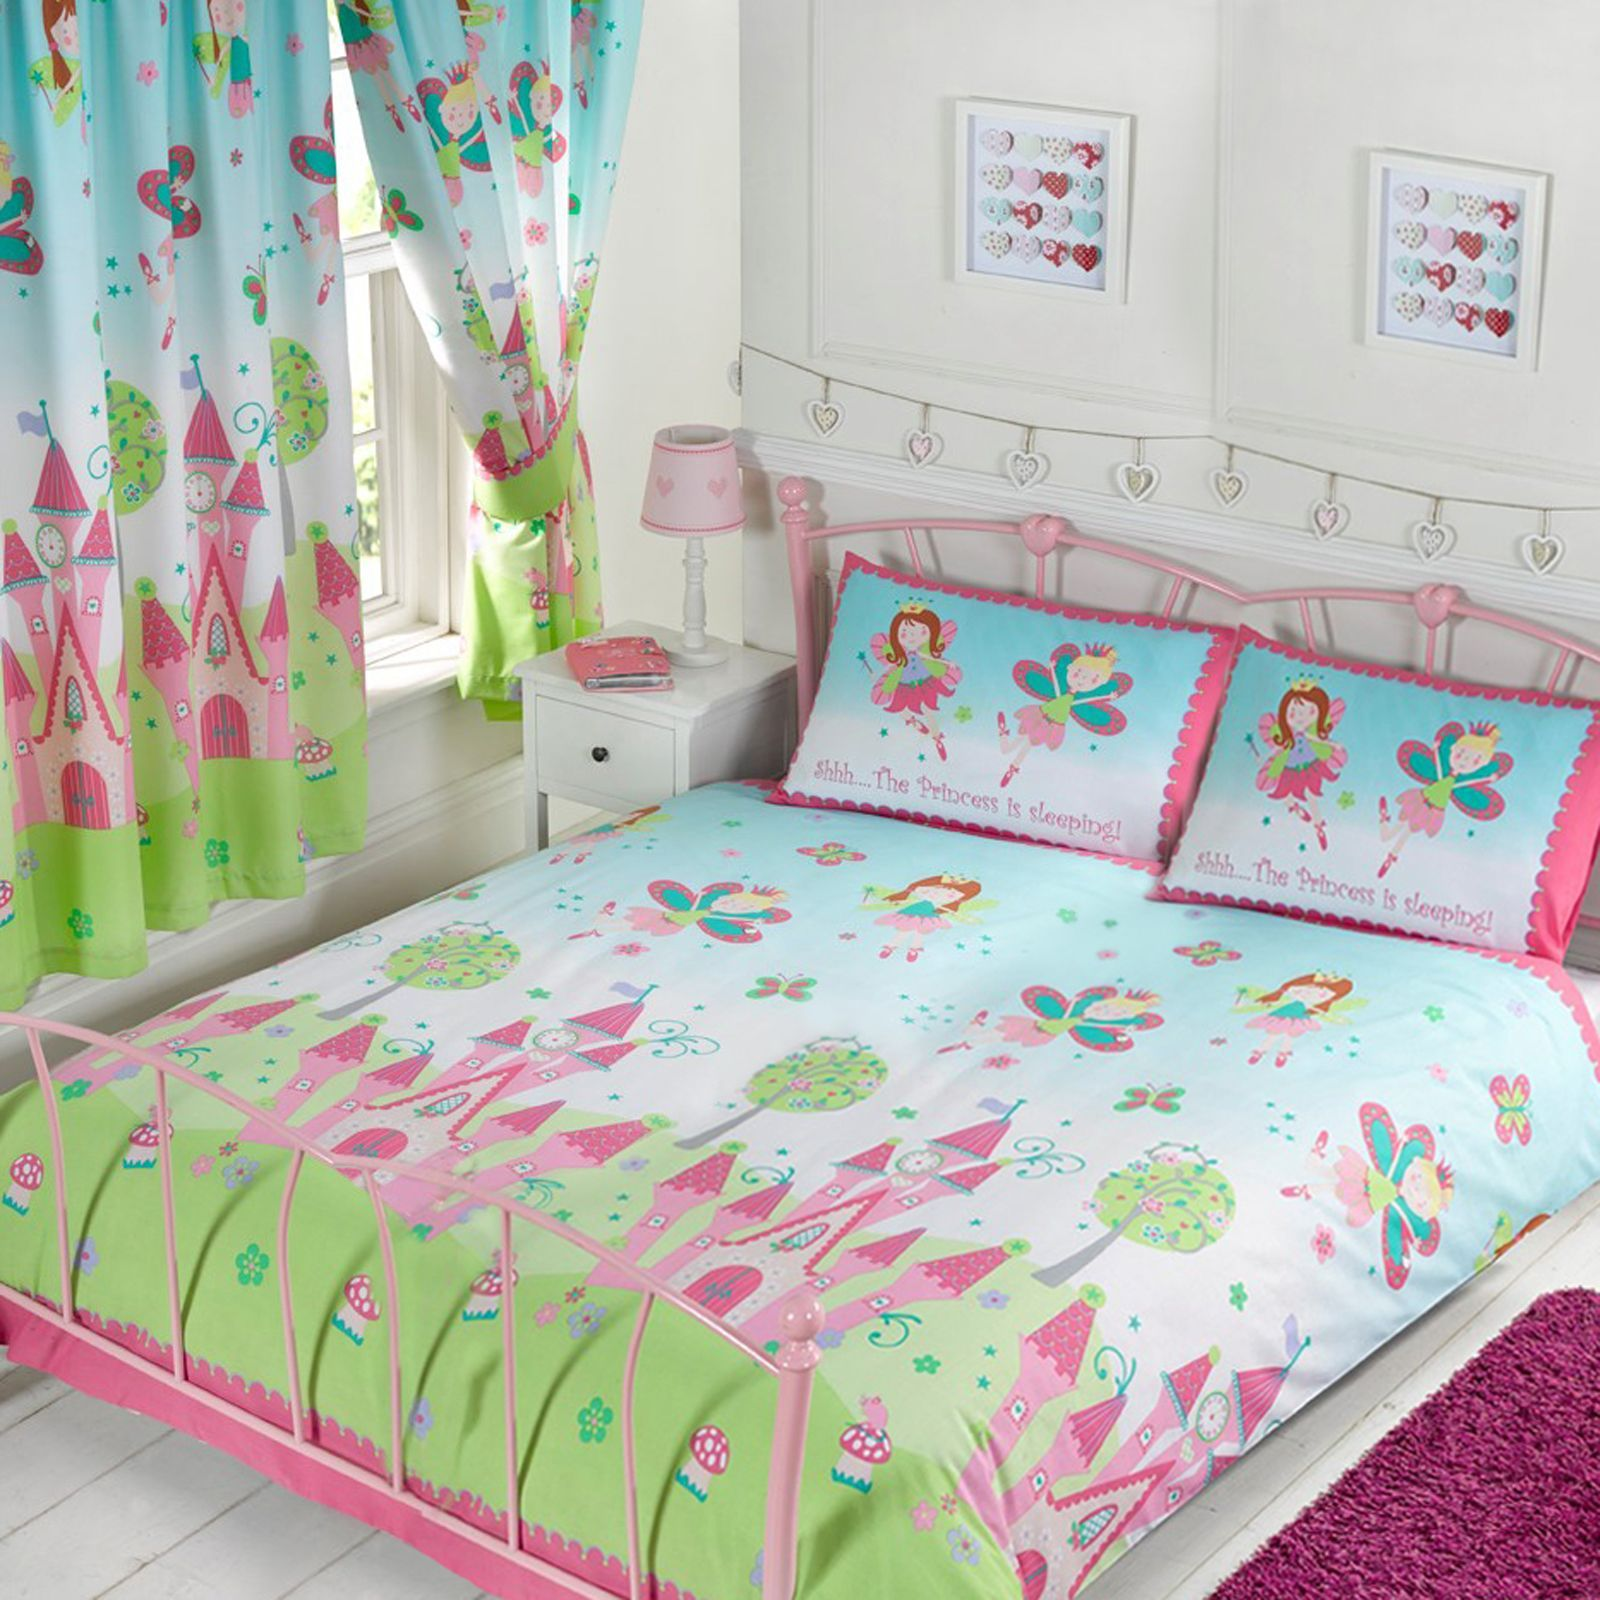 Full Duvet Set   Fairy and Princess Bedding   Pinterest   Fairy ... : double bed quilt - Adamdwight.com